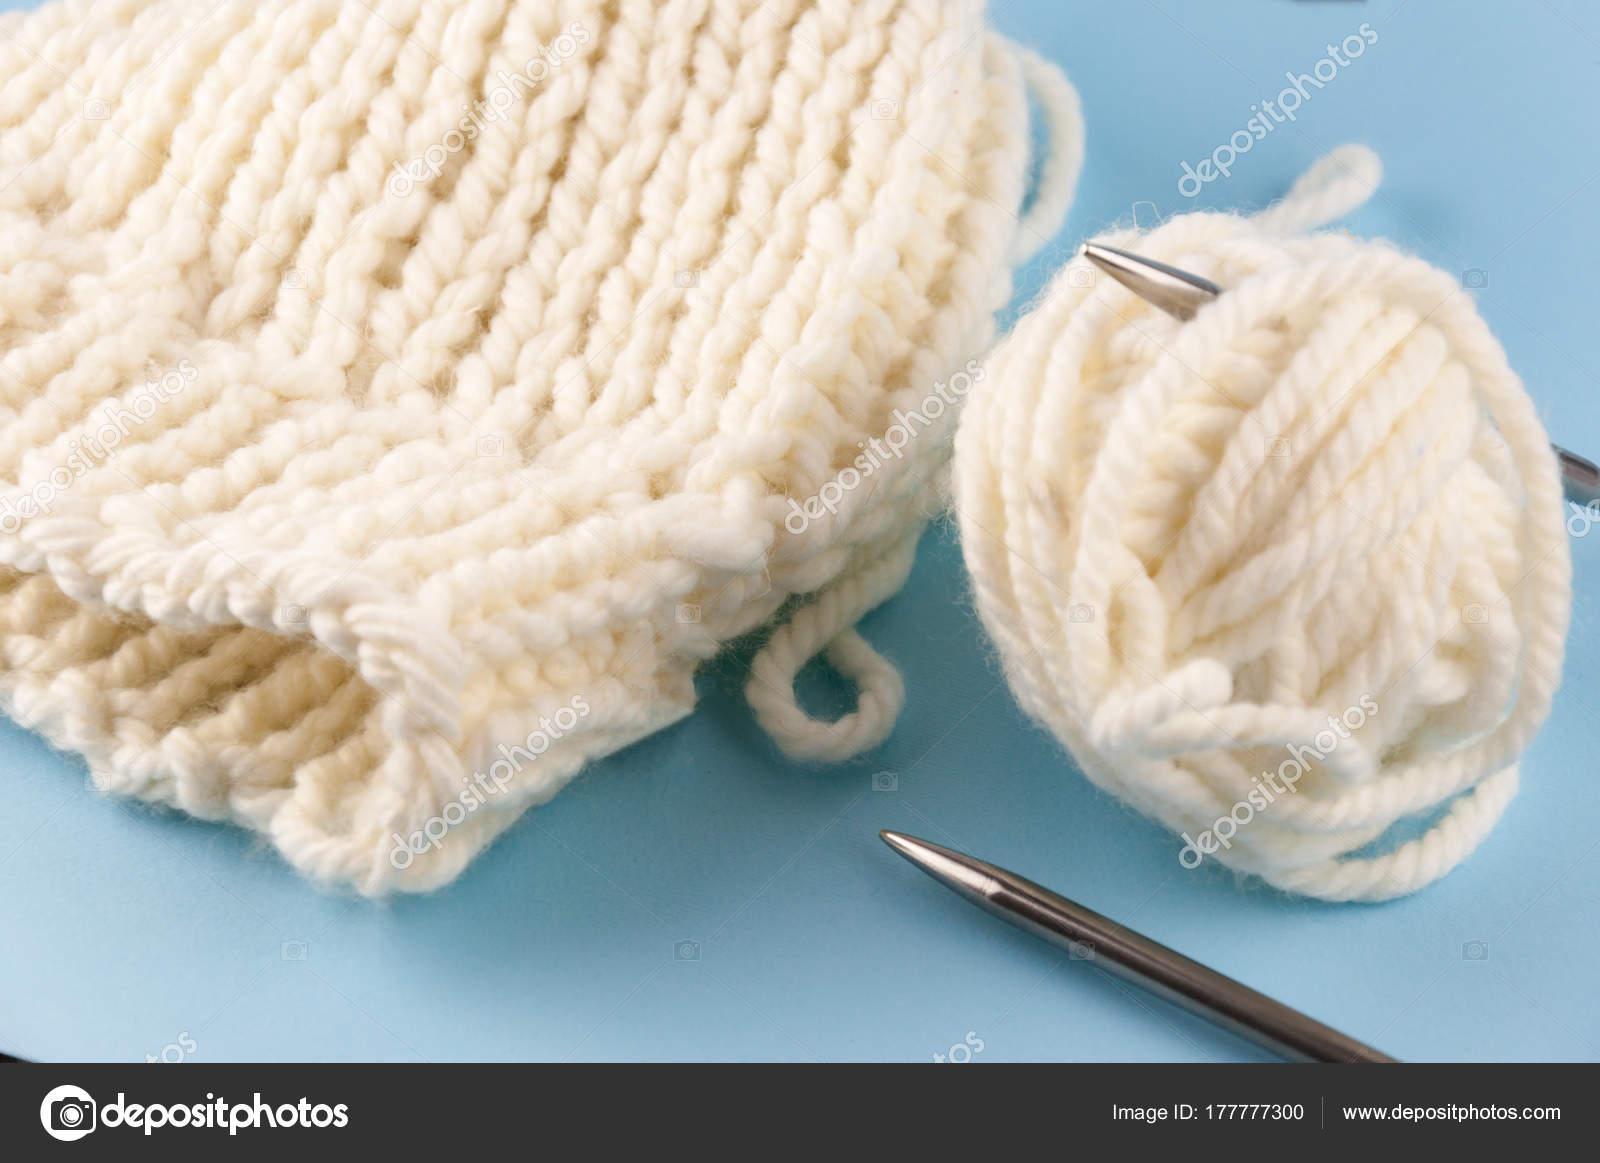 Tejer agujas e hilo sobre un fondo azul vintage, un casquillo atado ...